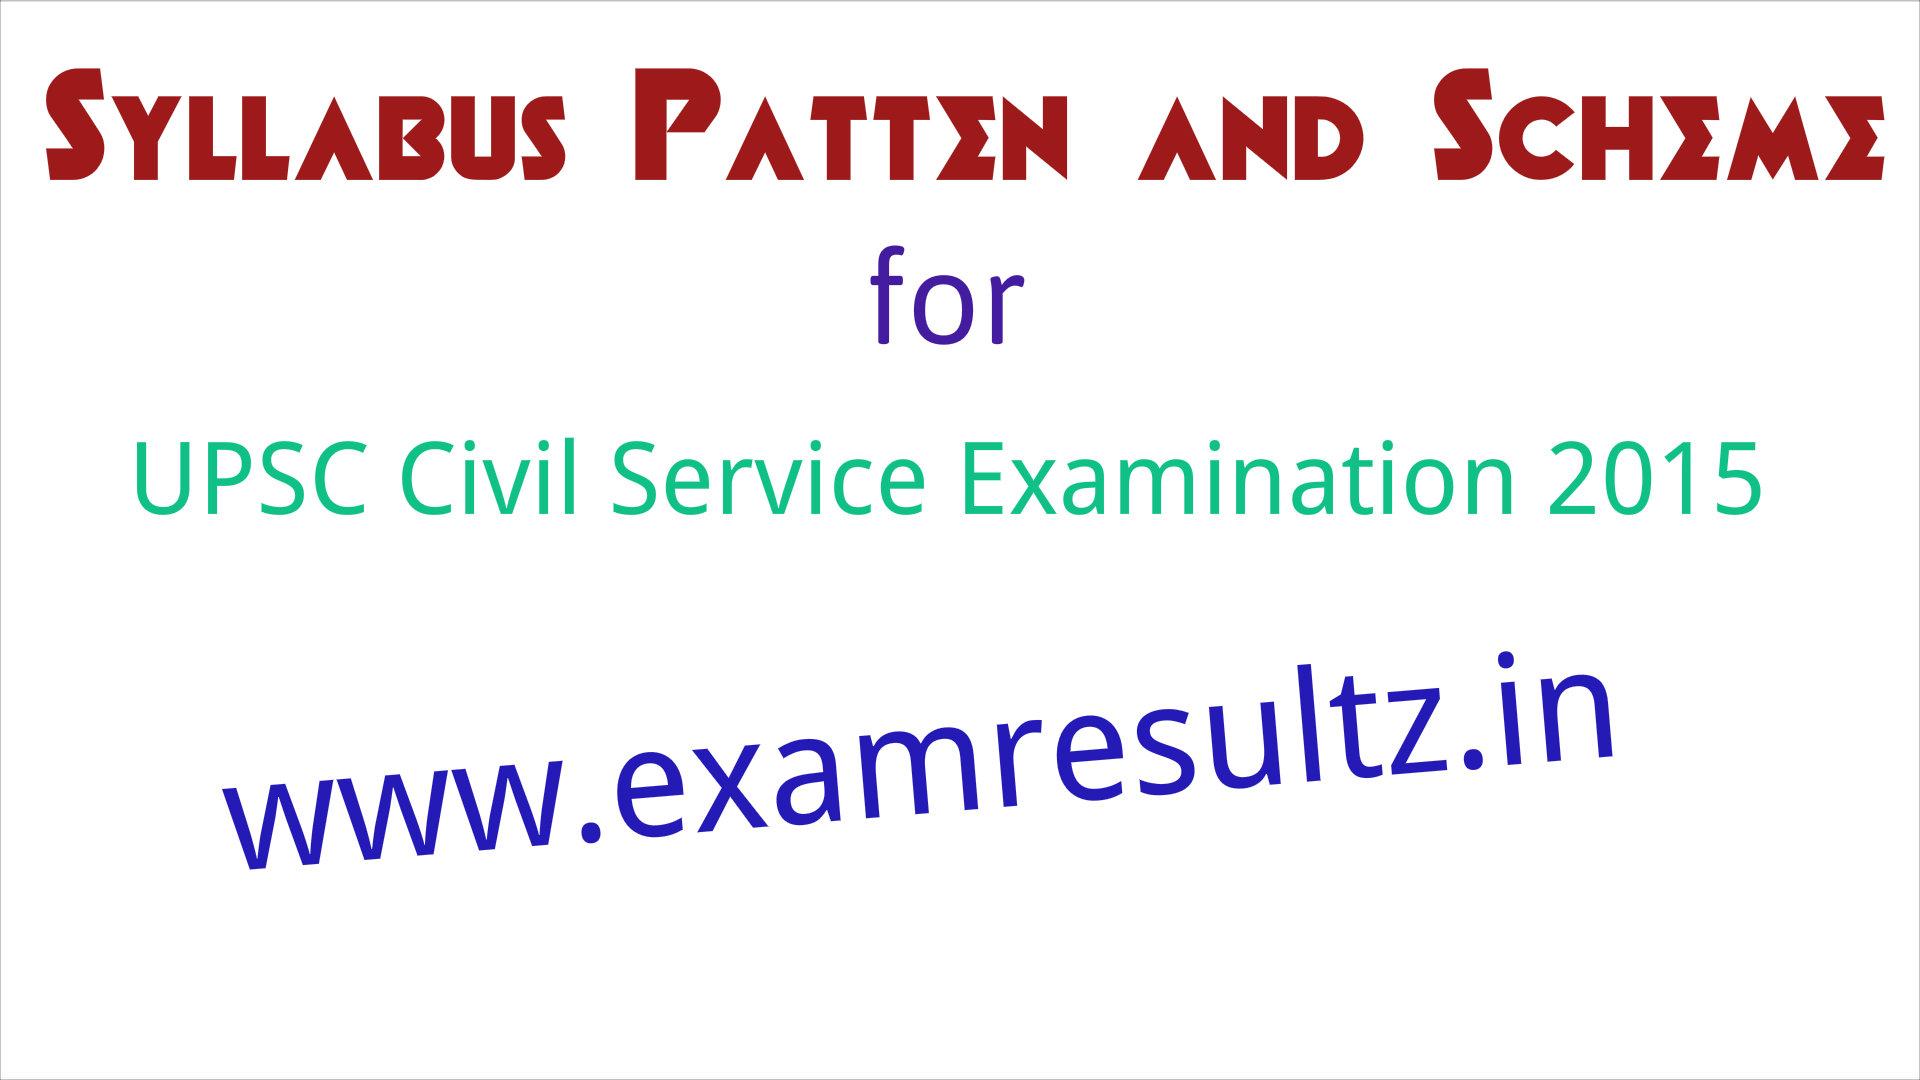 syllabus patten scheme upsc civil service preliminary examination 2015